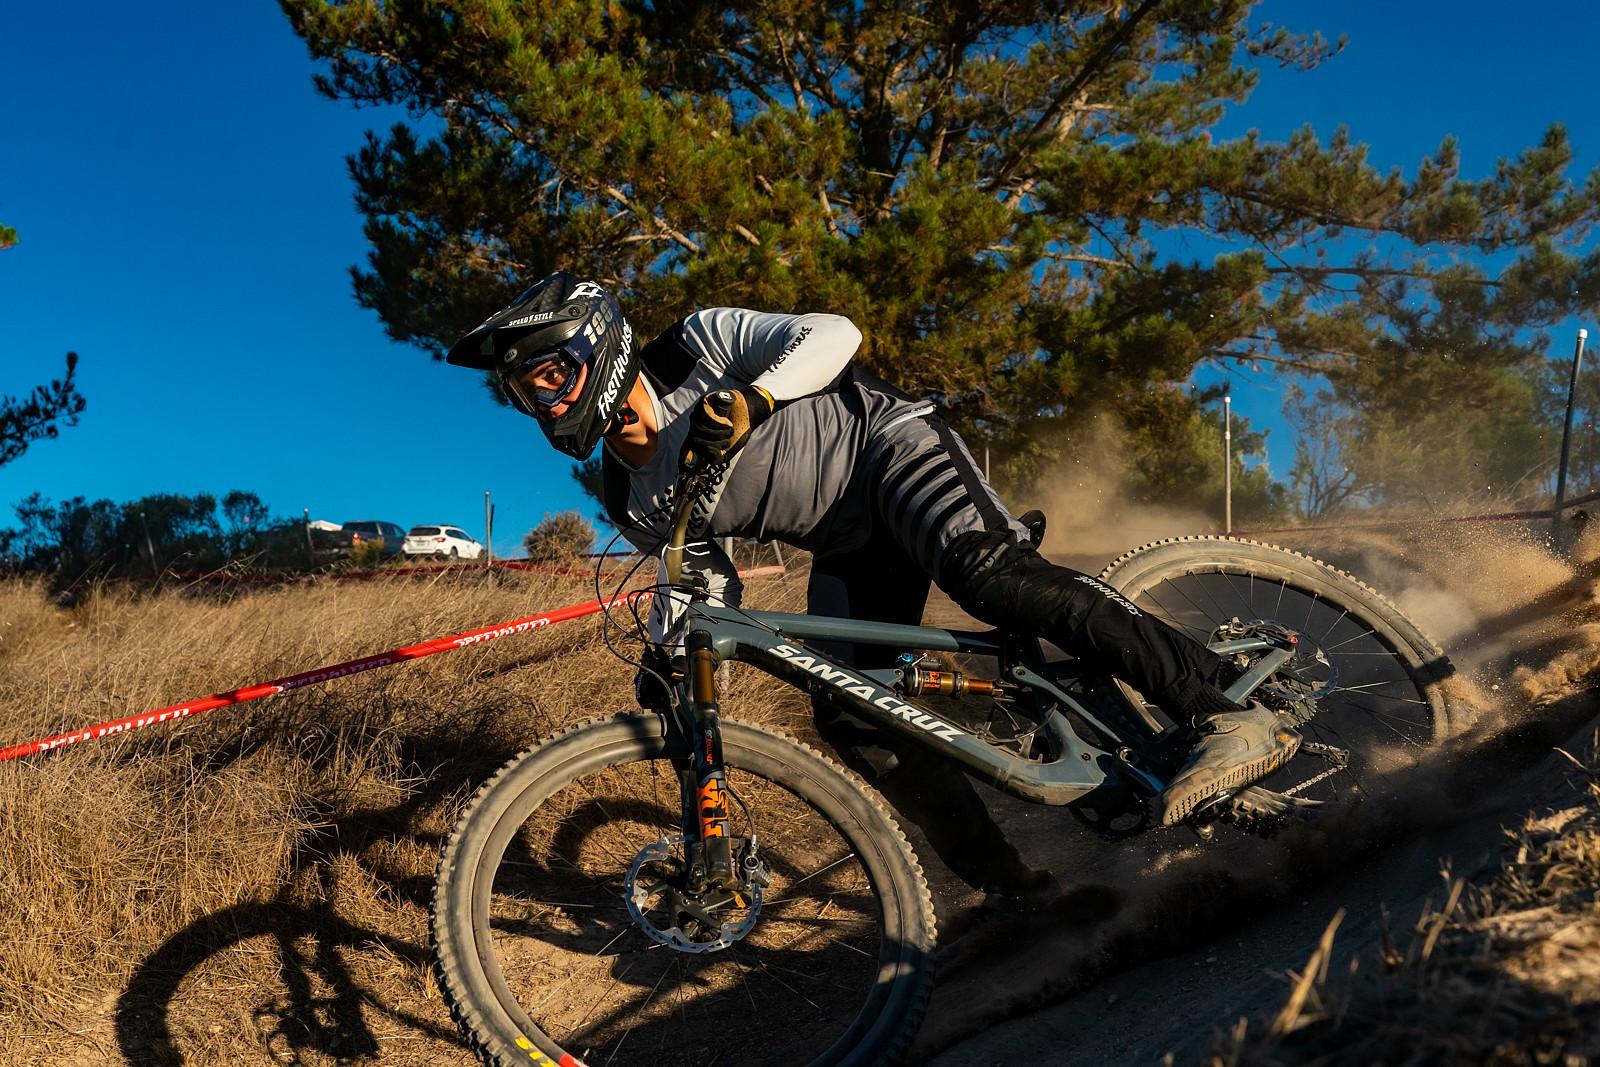 Niko Klik - Zuestman - Mountain Biking Pictures - Vital MTB